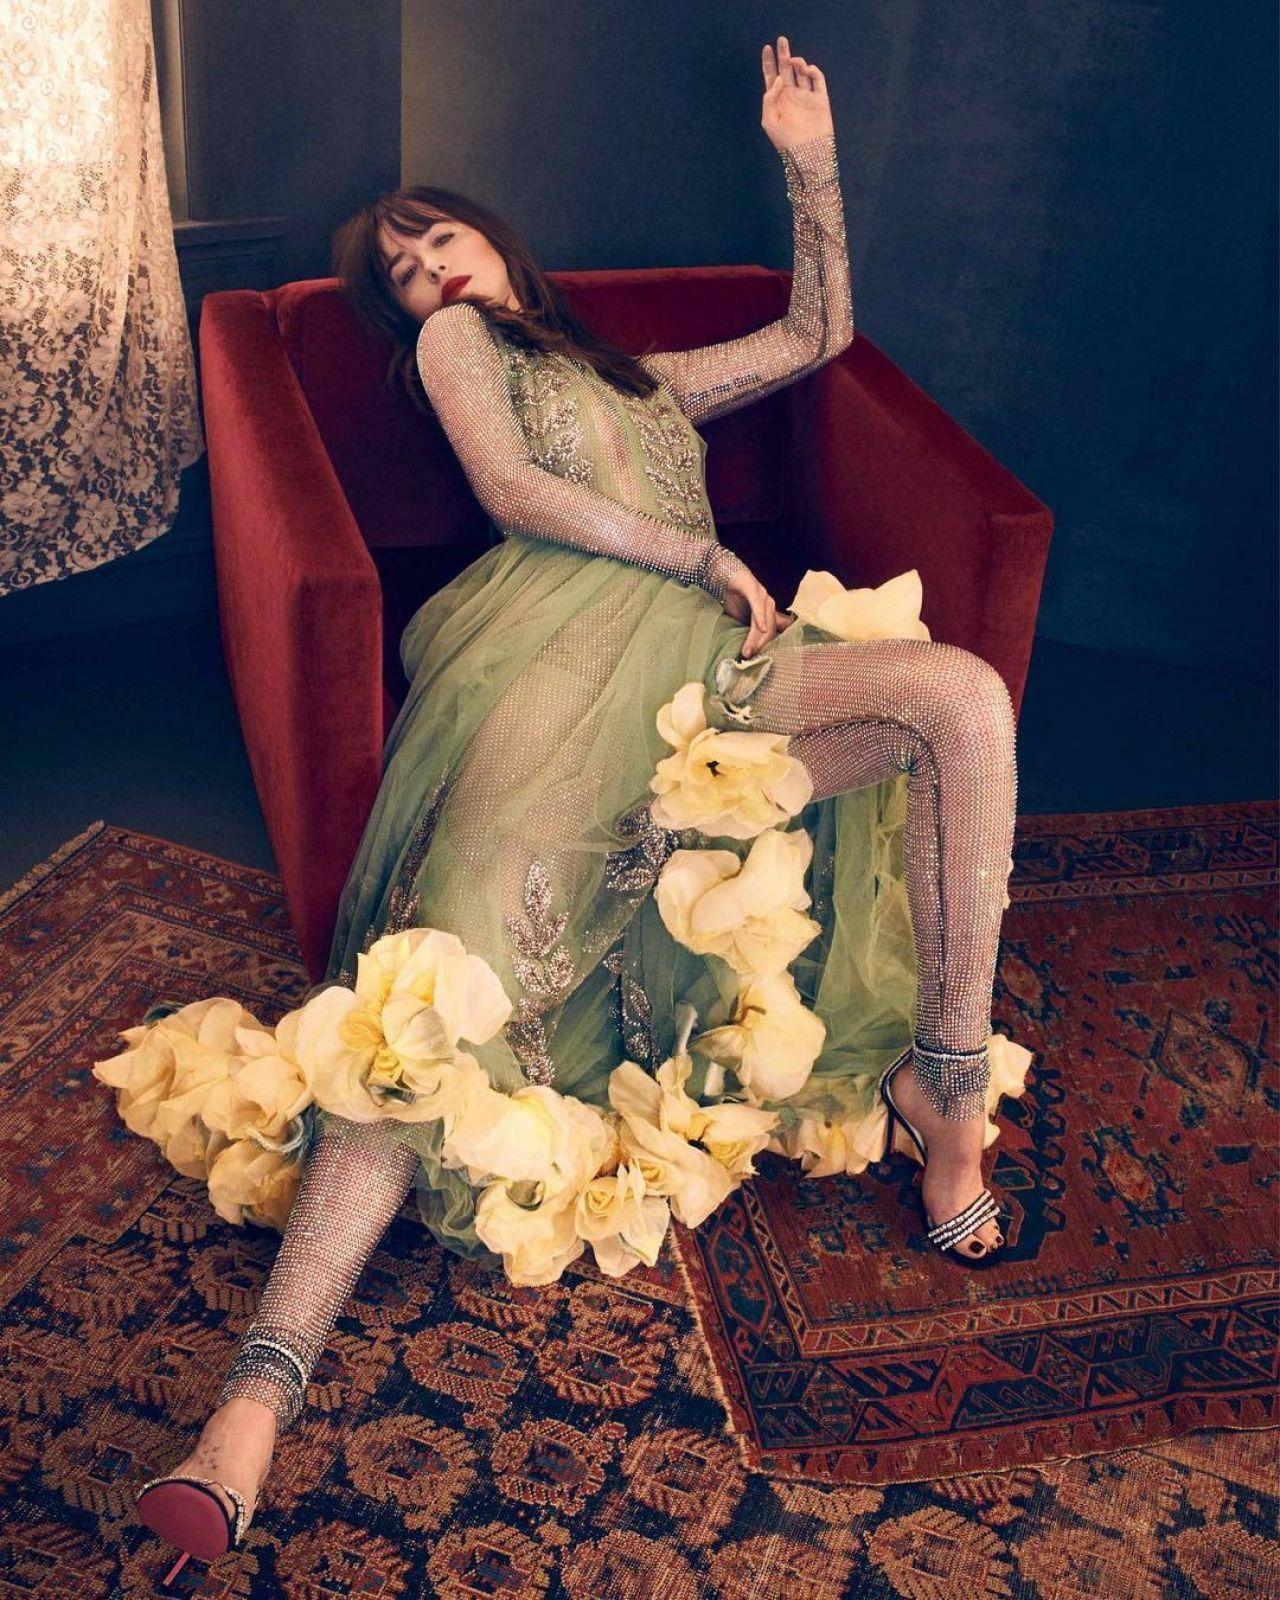 Dakota Johnson Photographed For Vogue Spain 2017